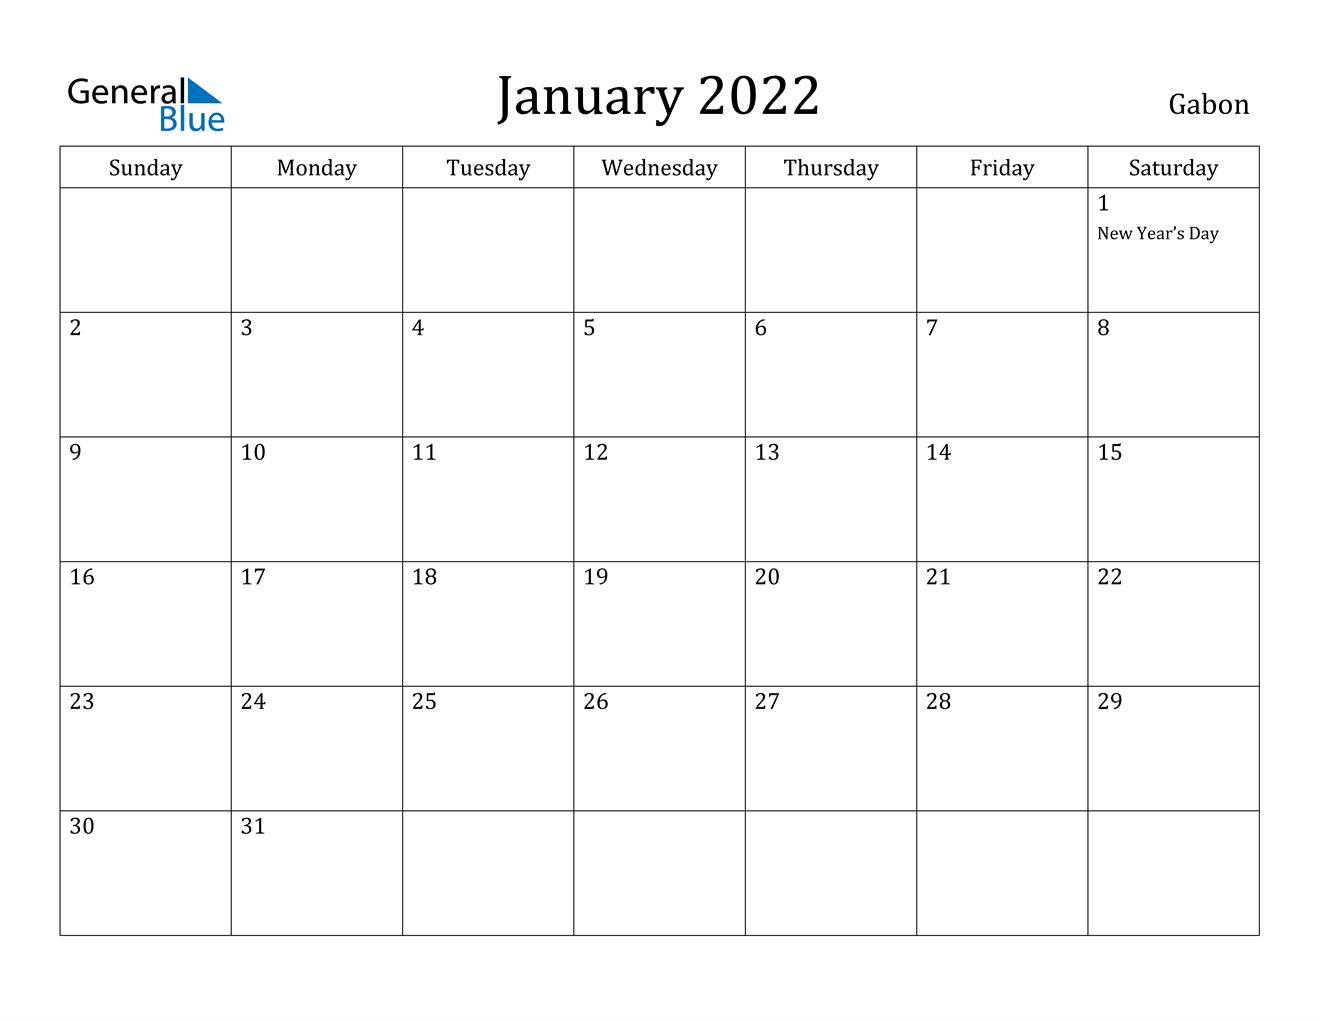 January 2022 Calendar - Gabon